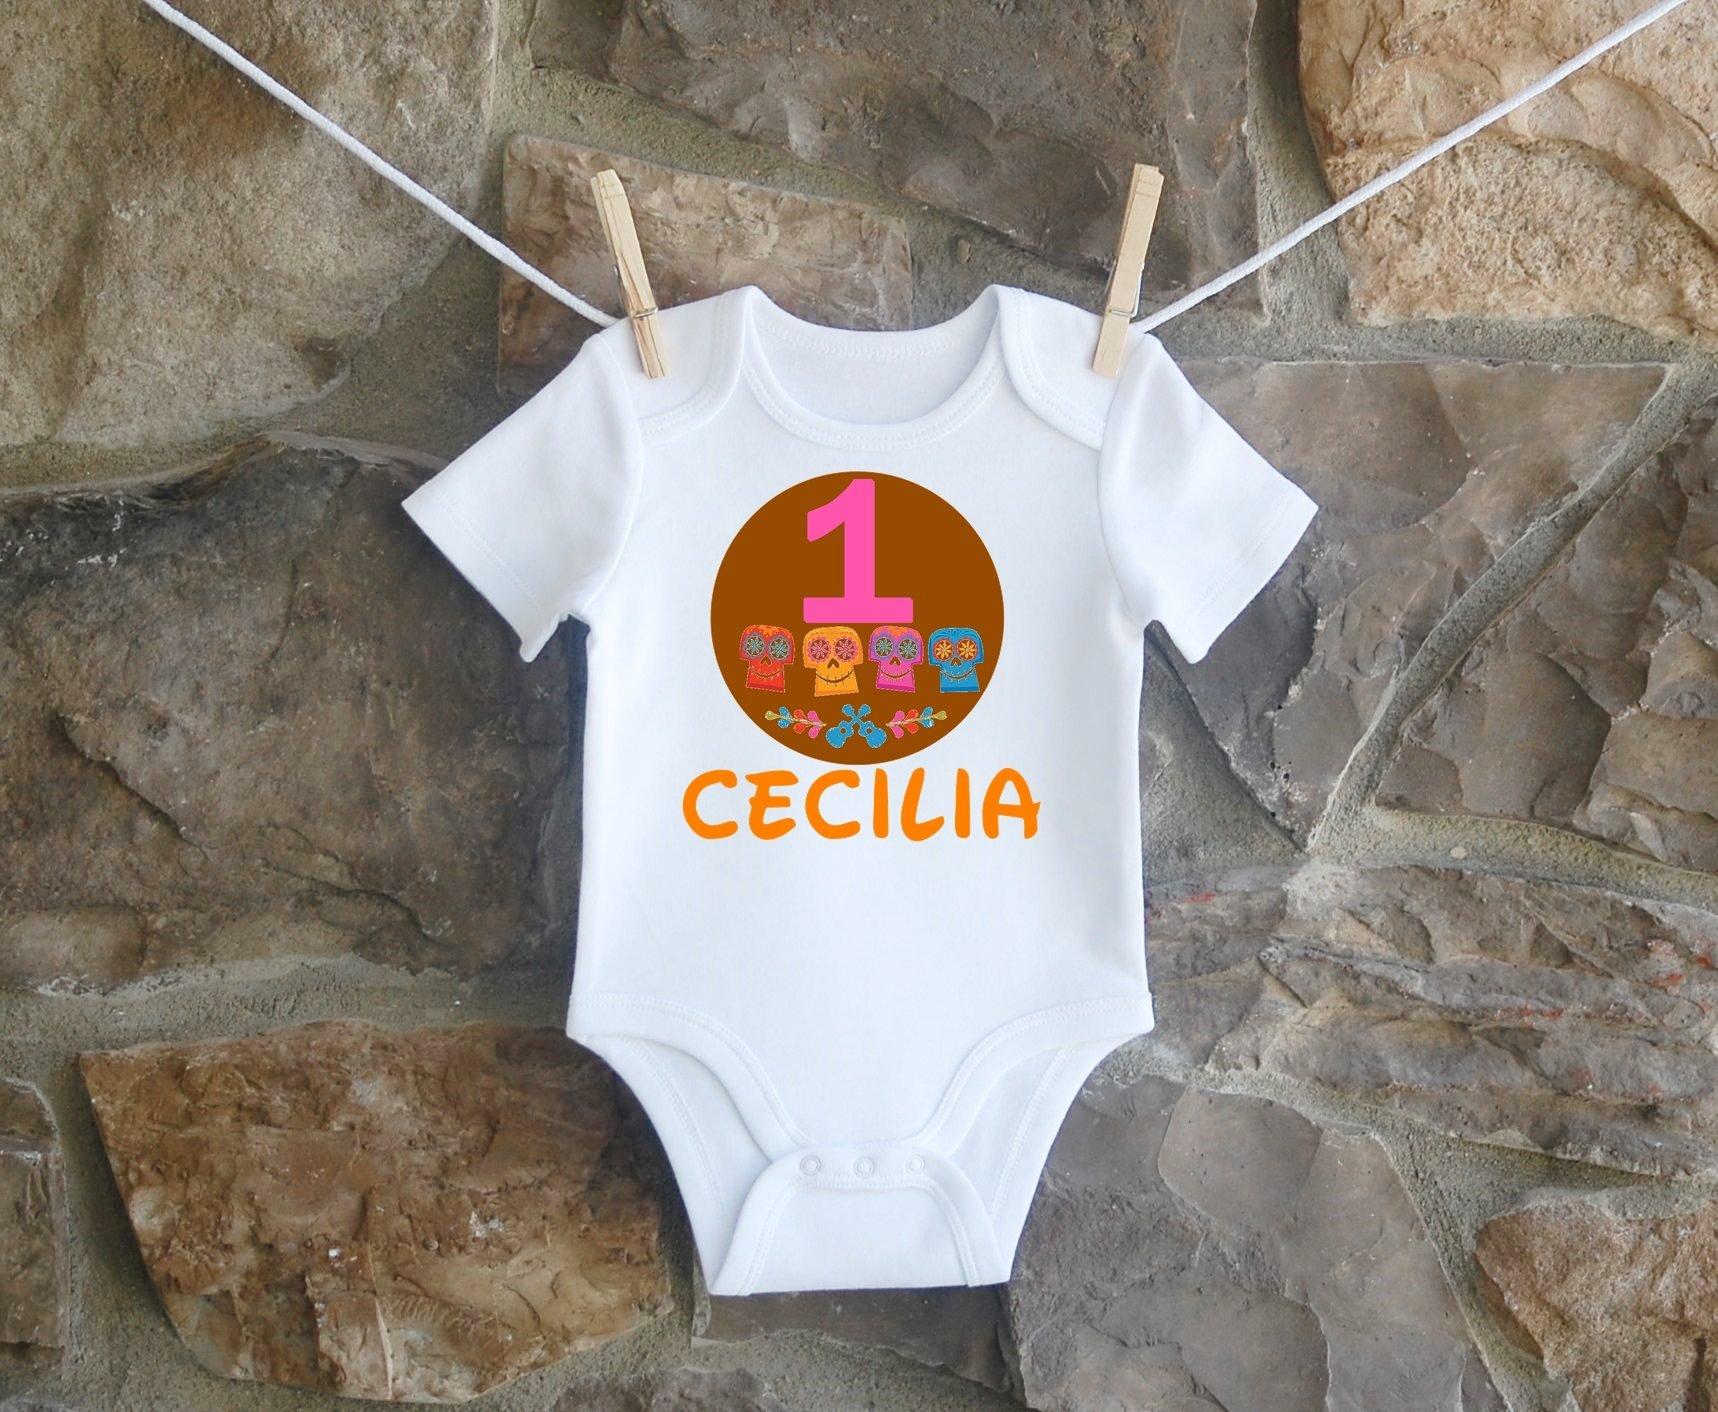 Coco Birthday Shirt, Coco Birthday Shirt For Girls, Personalized Girls Coco Birthday Shirt, Customized Coco Birthday Shirt